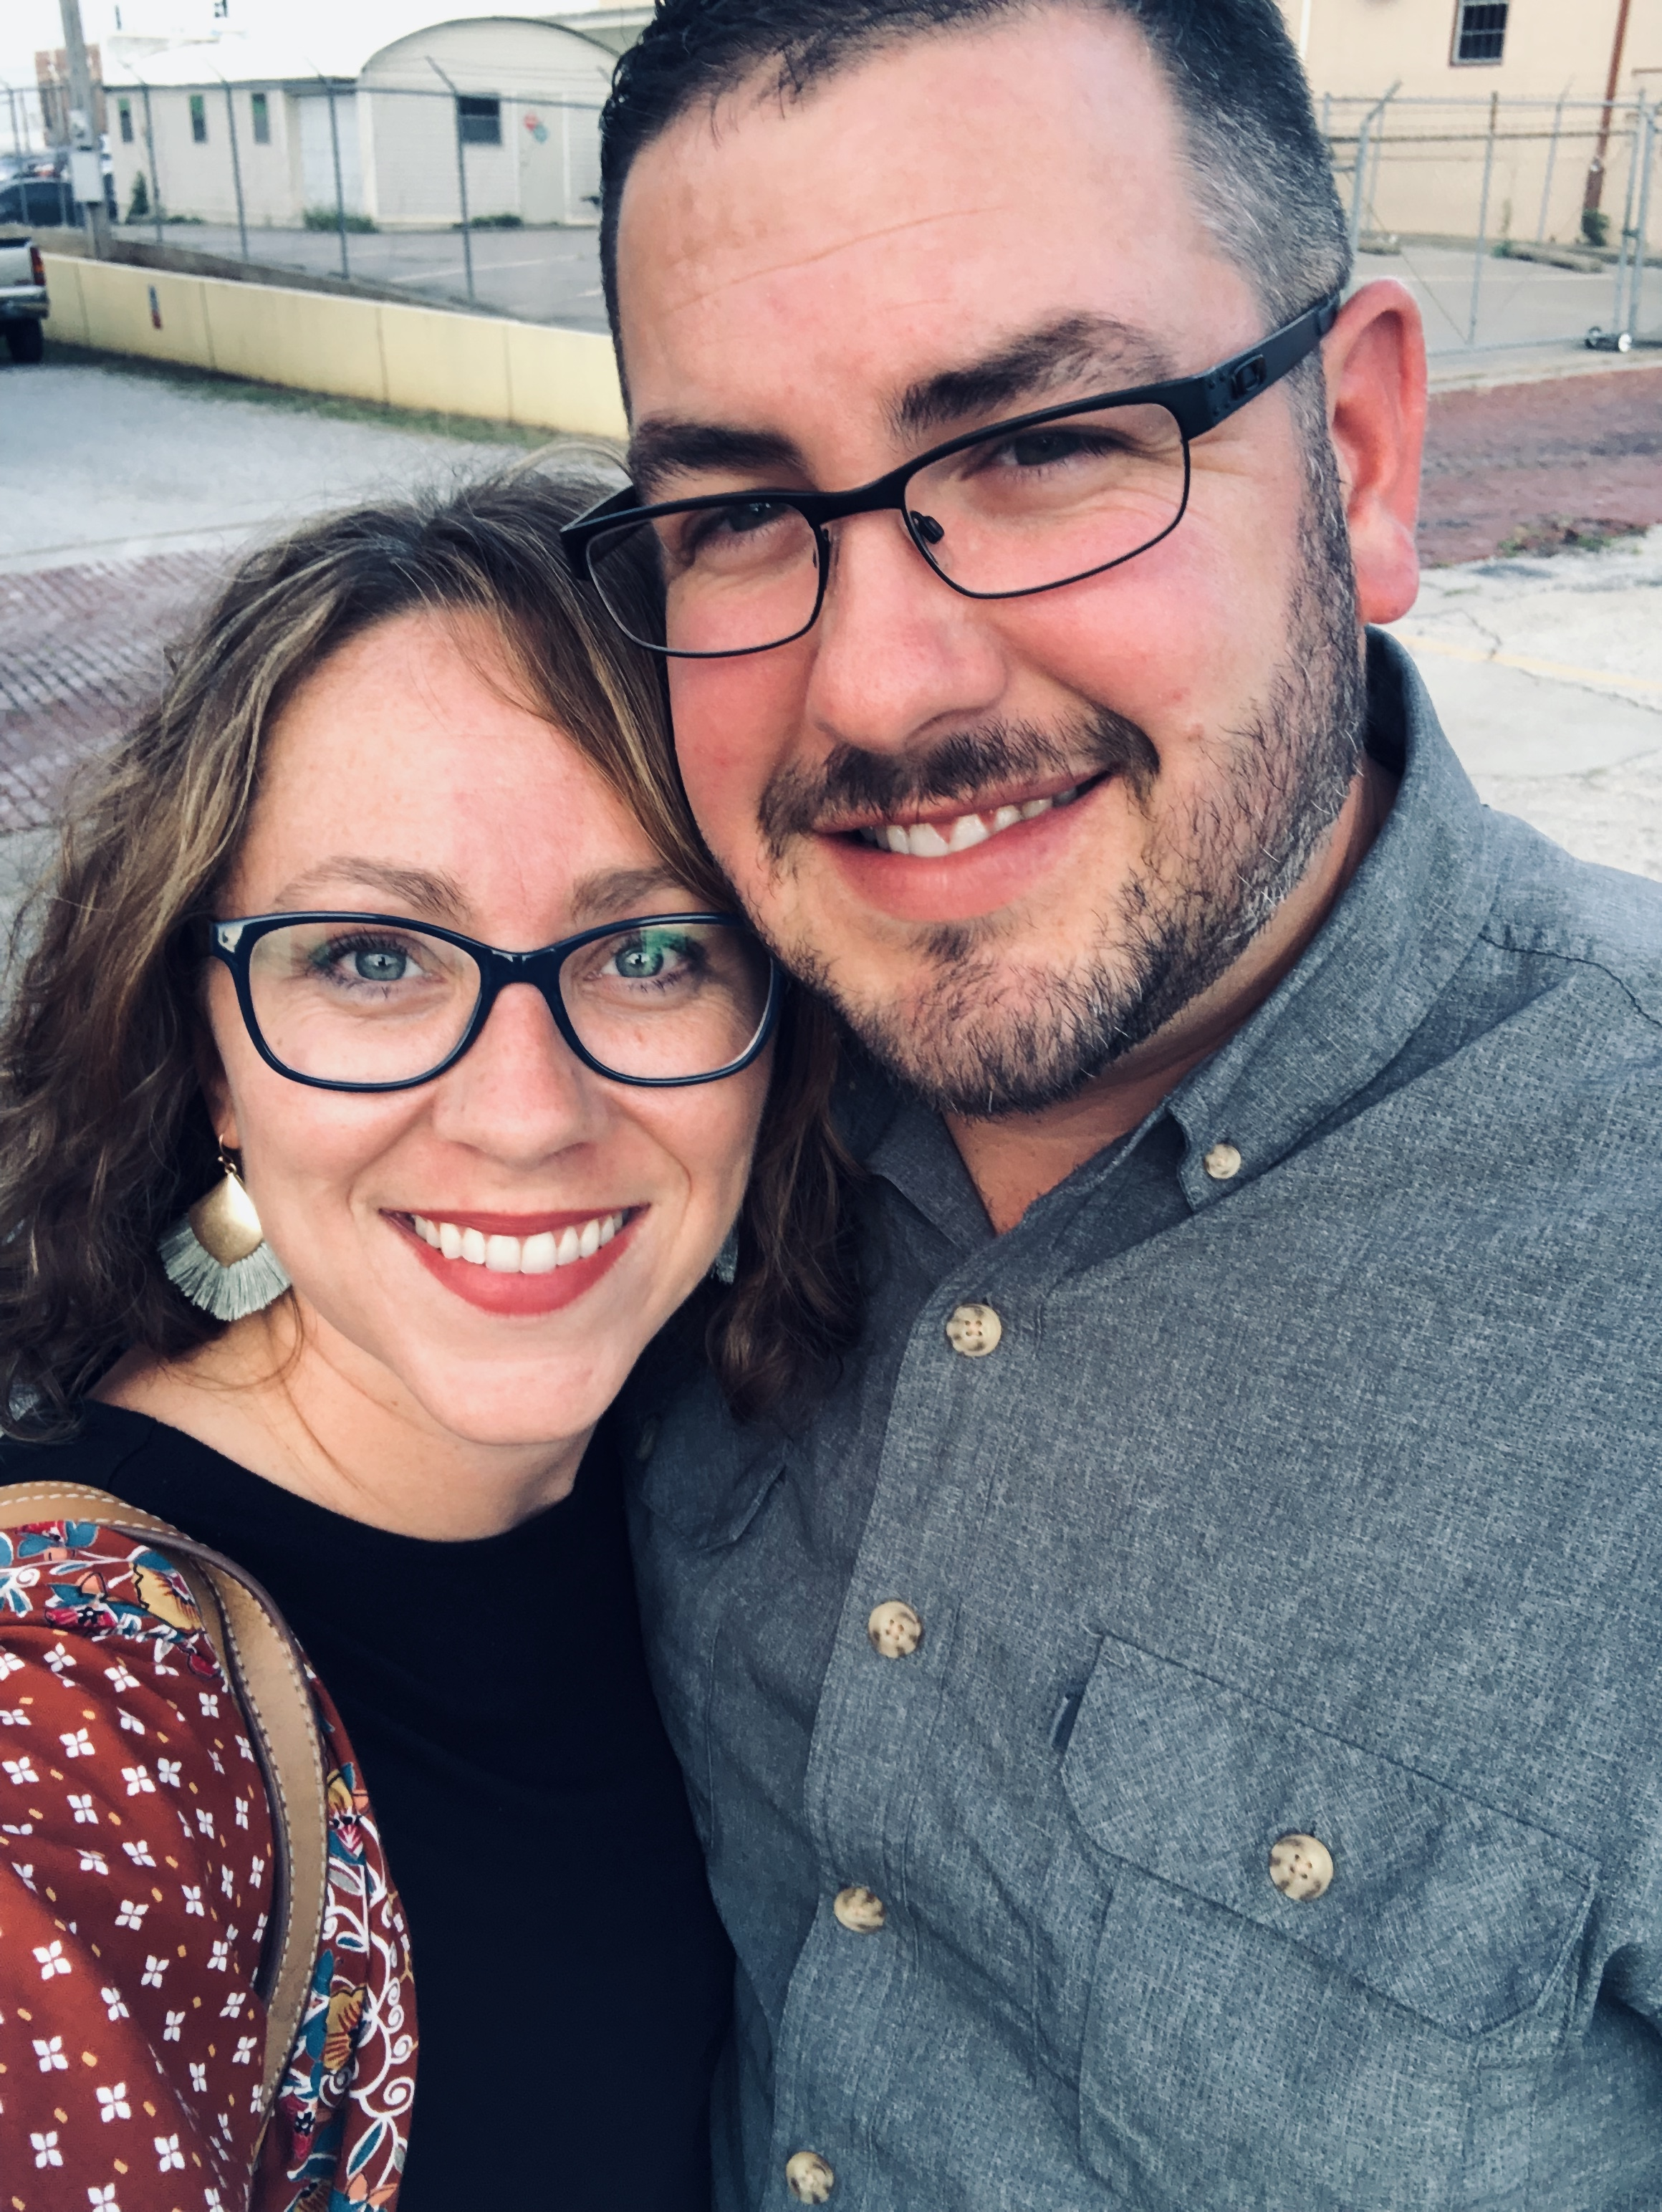 Man and woman selfie